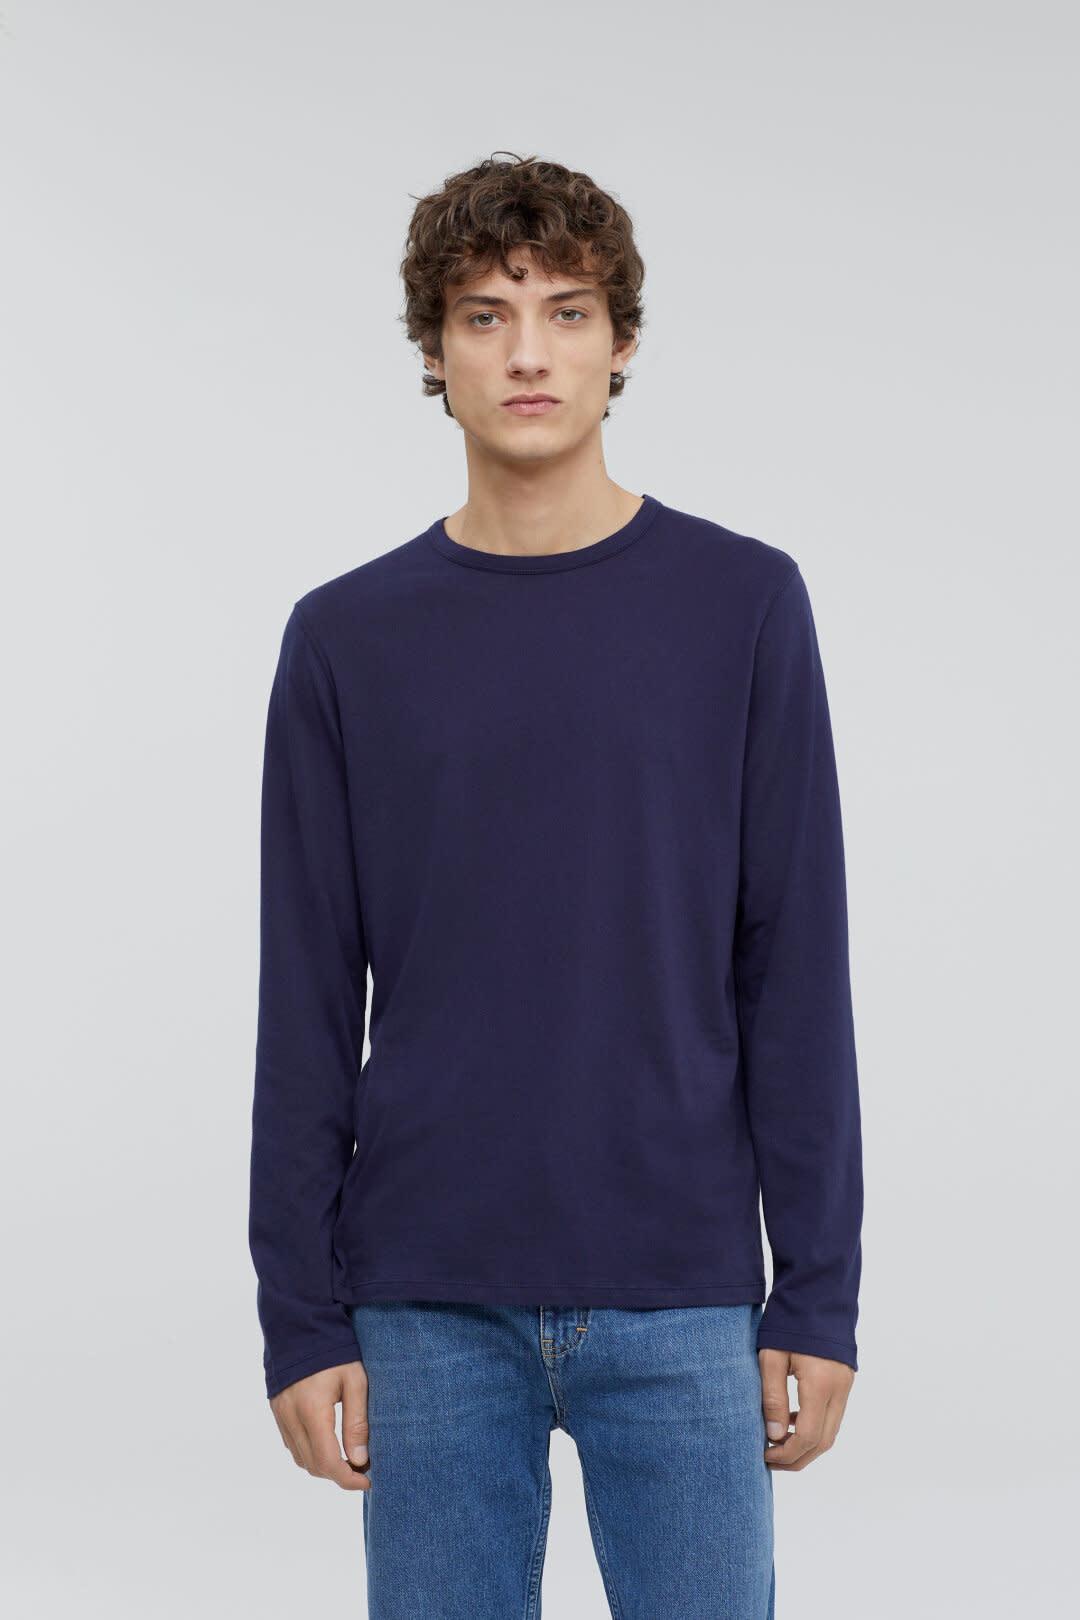 Cotton cashmere longsleeve dark night-3